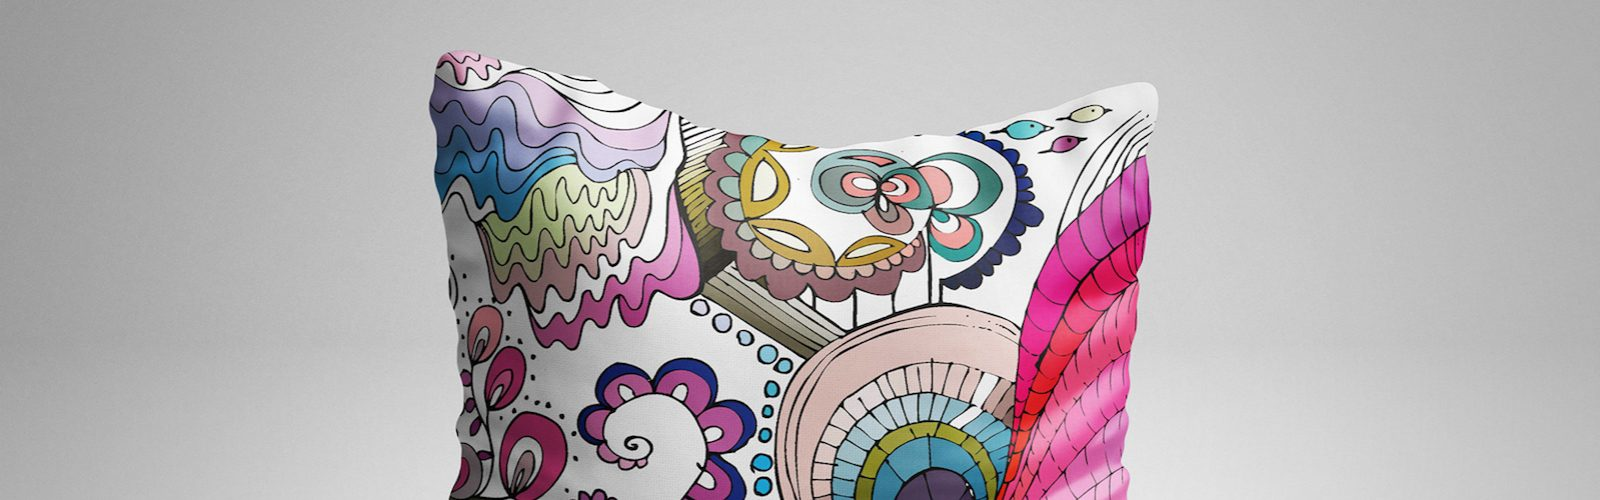 illistration-cusciono-grafica-handmade-melographicstudio